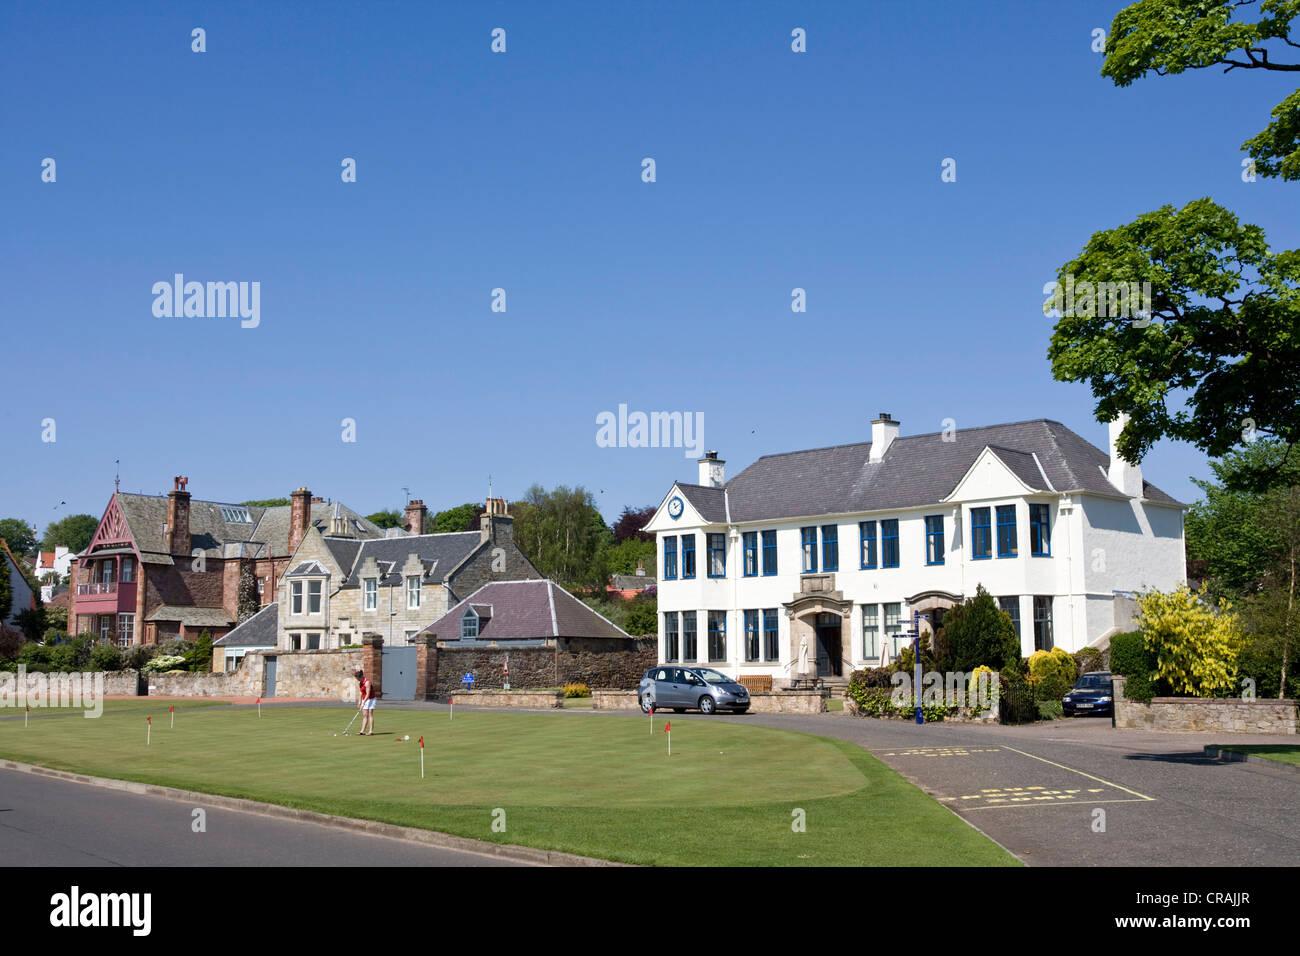 Members Clubhouse Gullane Golf Club, Scotland. - Stock Image